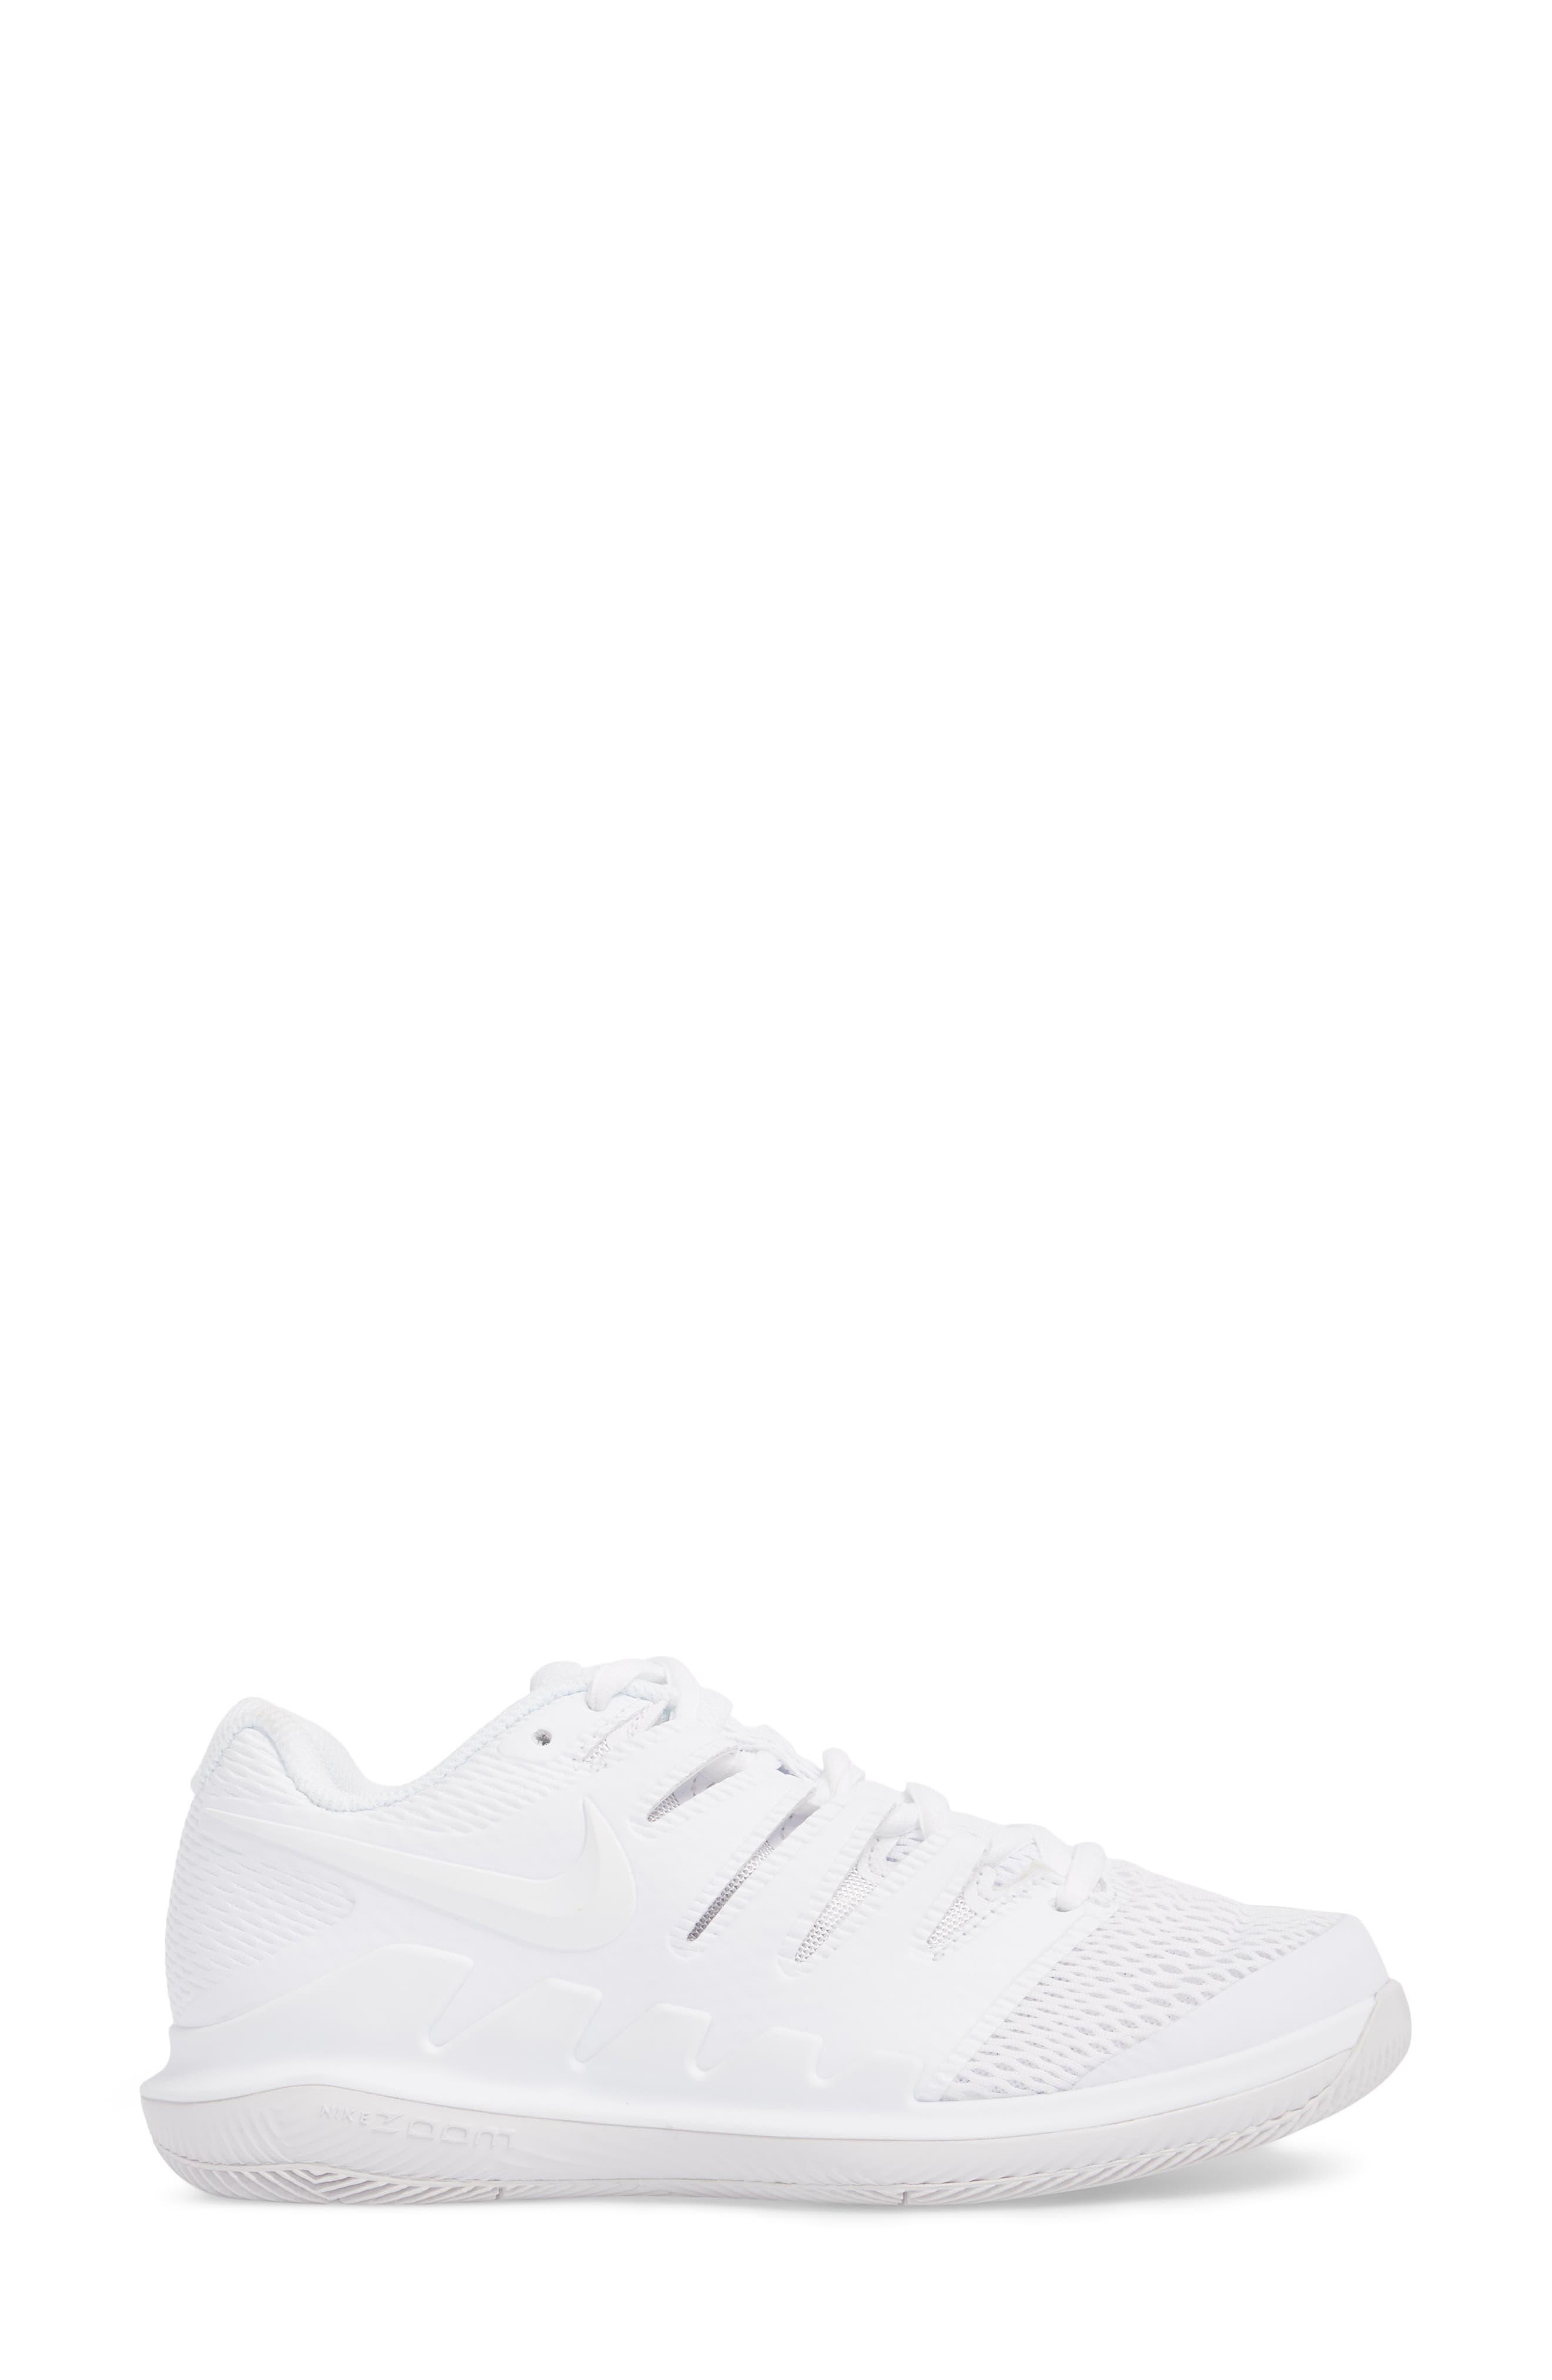 Air Zoom Vapor X Tennis Shoe,                             Alternate thumbnail 3, color,                             WHITE/ WHITE/ VAST GREY